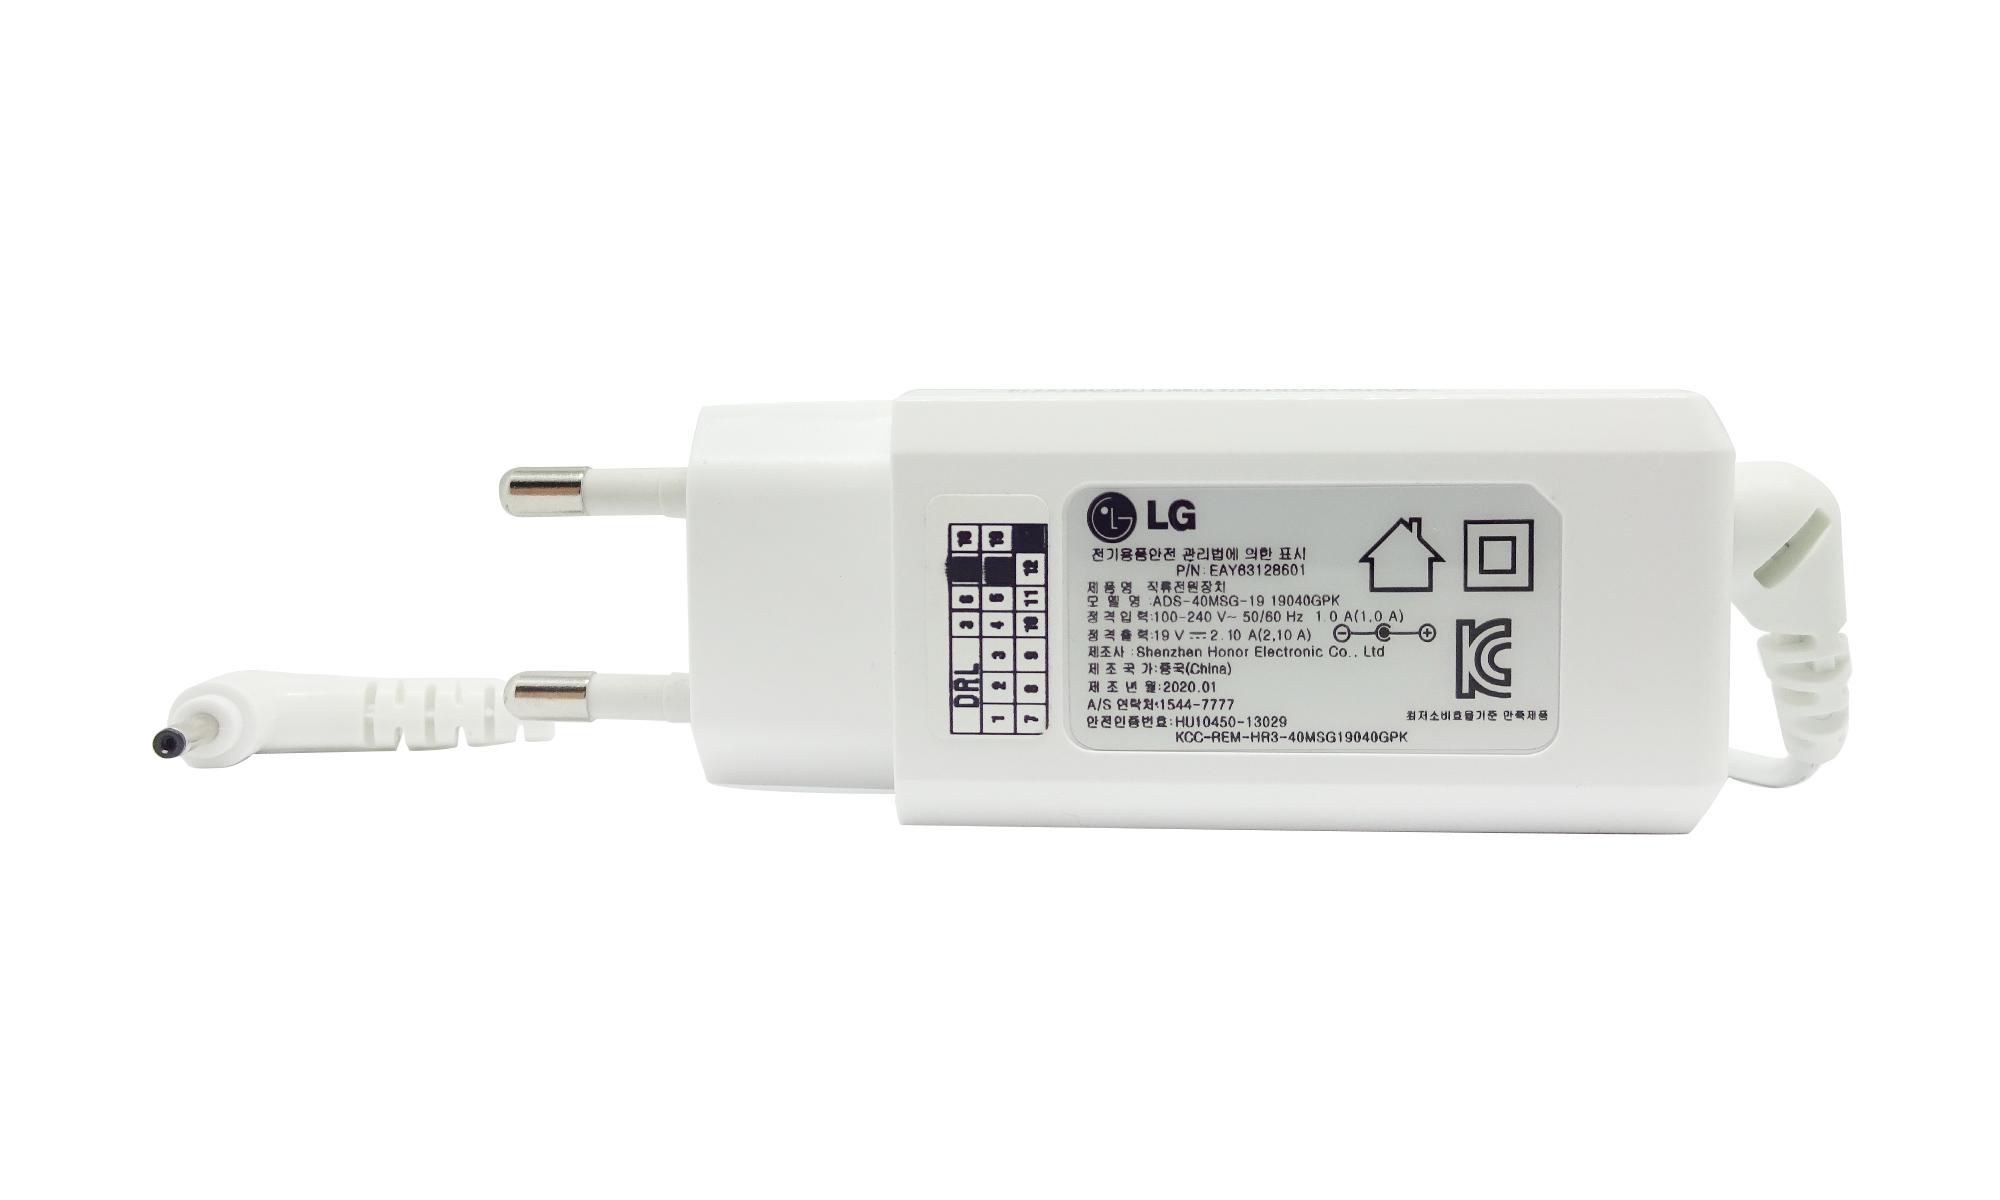 Incarcator original LG Gram, 19V, 2.1A, 40W, mufa 3 x 1mm, alb